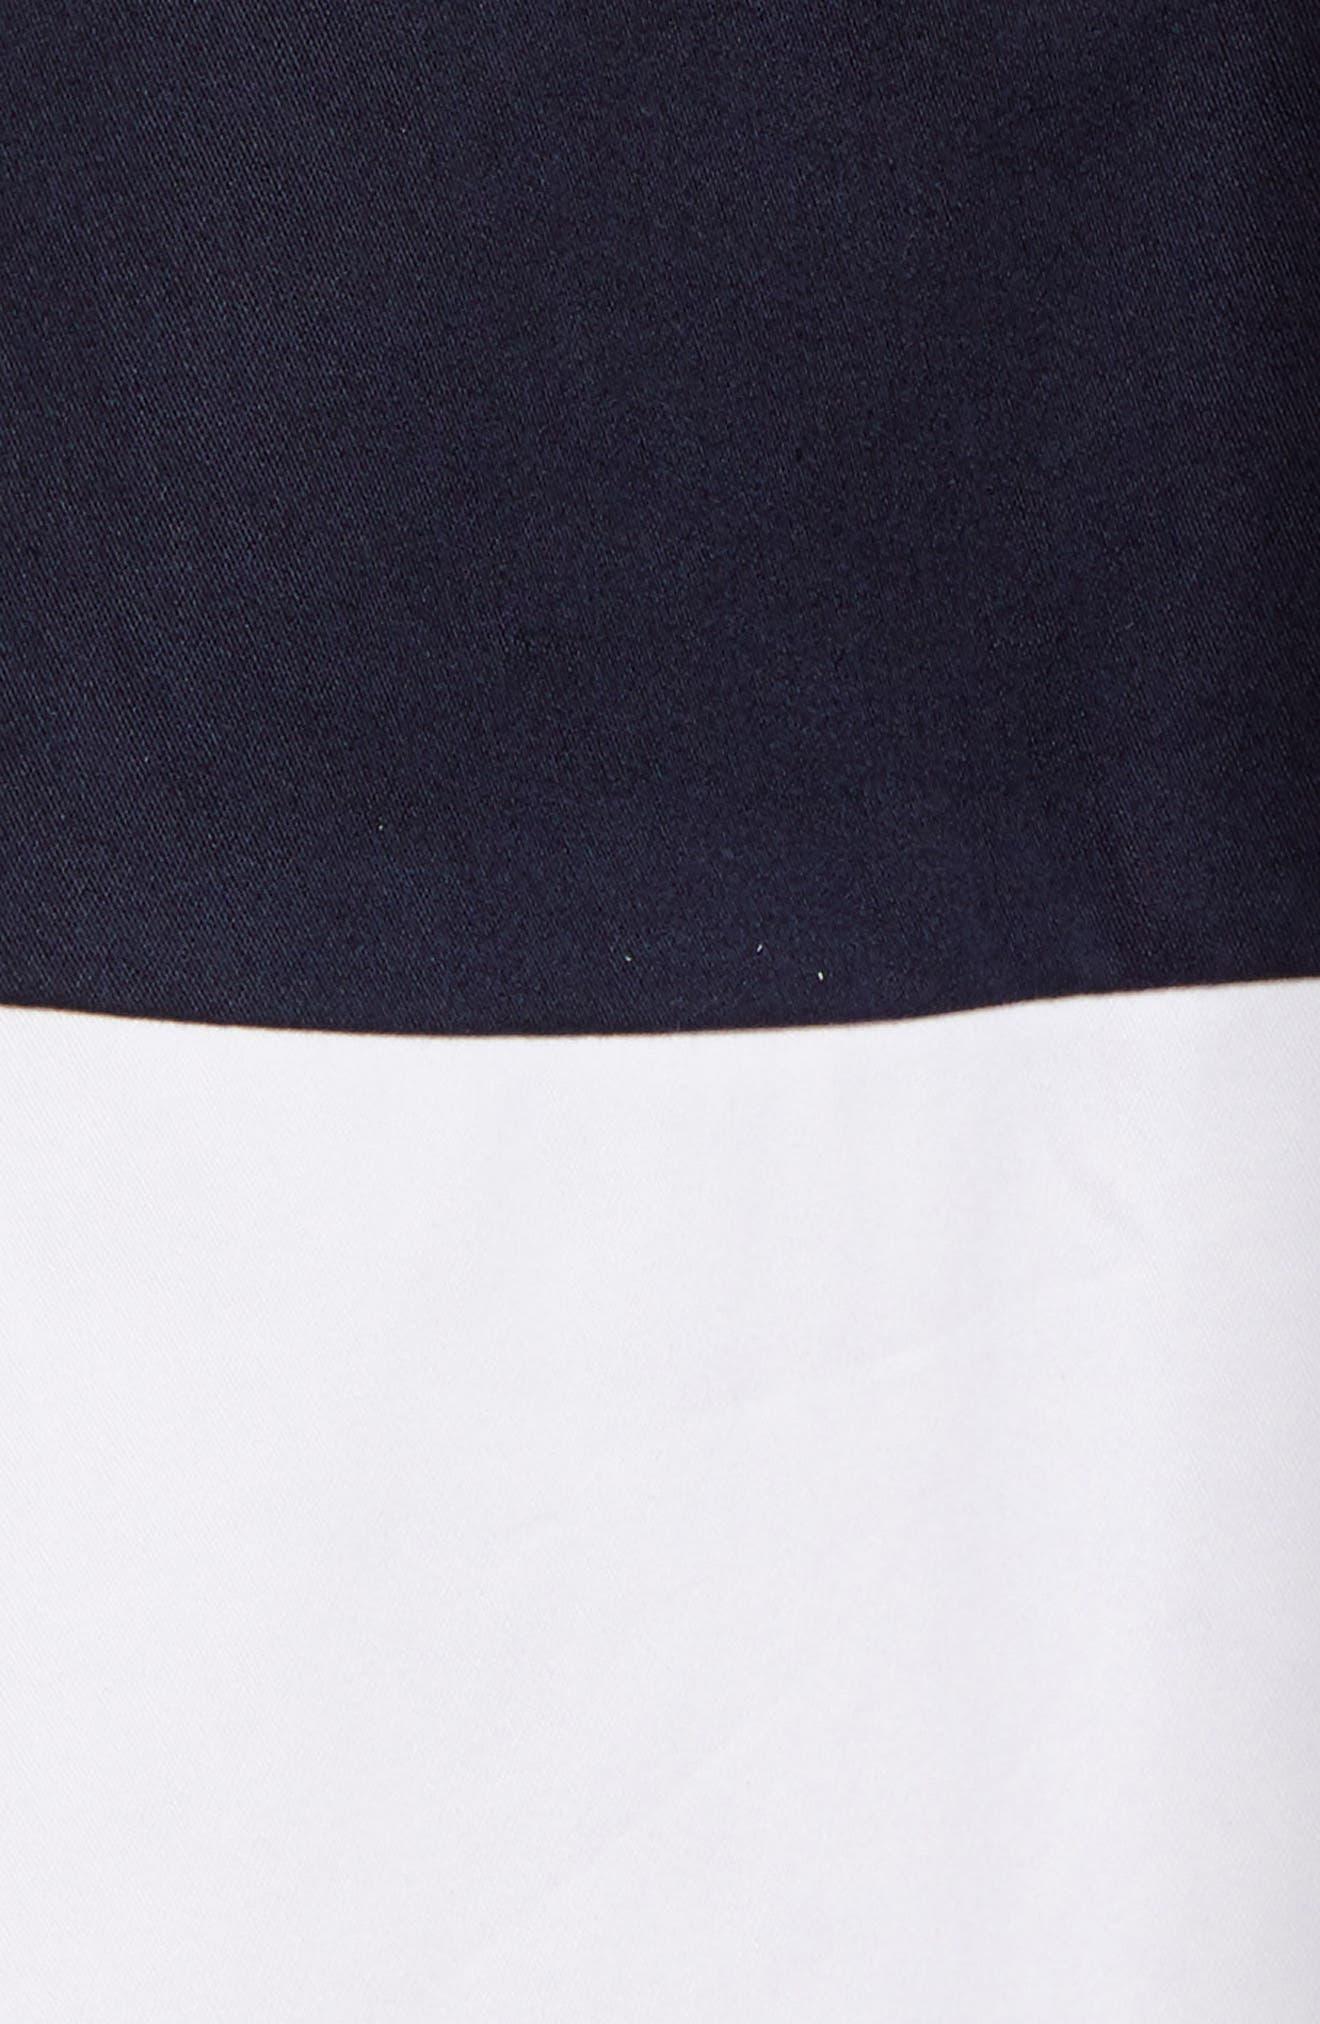 Stripe Fit & Flare Dress,                             Alternate thumbnail 5, color,                             410